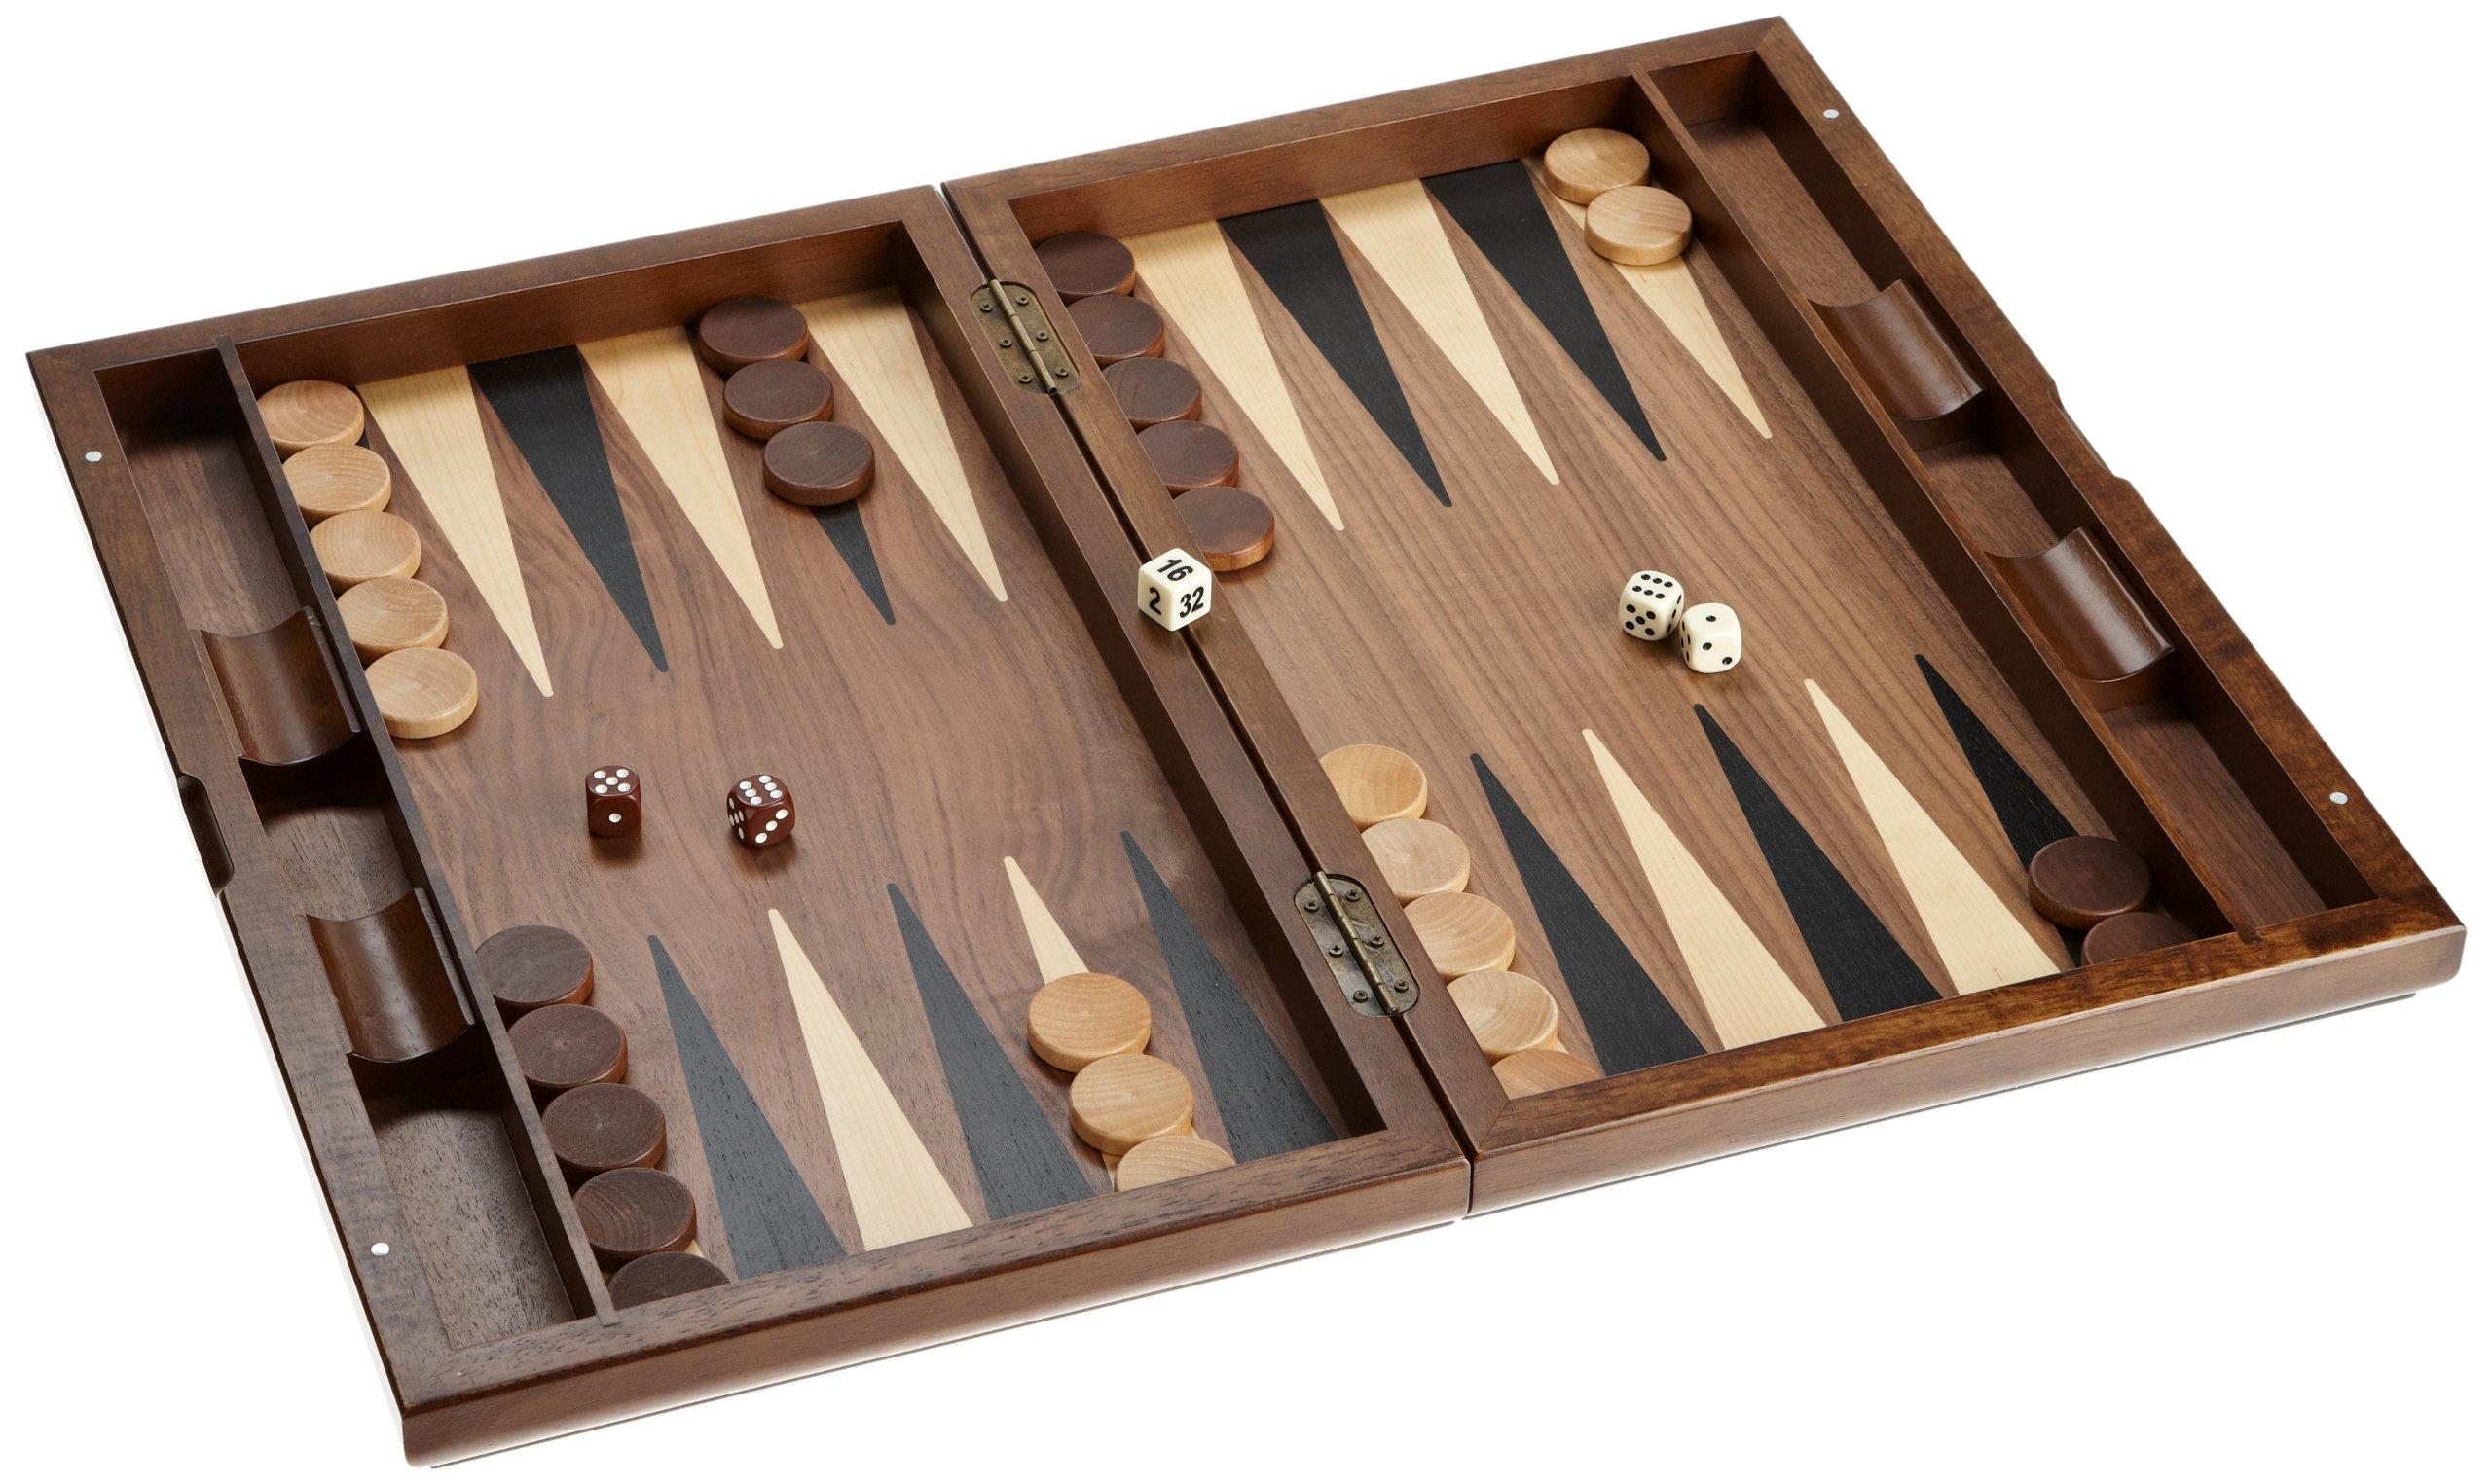 Philos-2525-Schach-Backgammon-Dame-Set-Magnetverschluss-Feld-50-mm-Knigshhe-90-mm